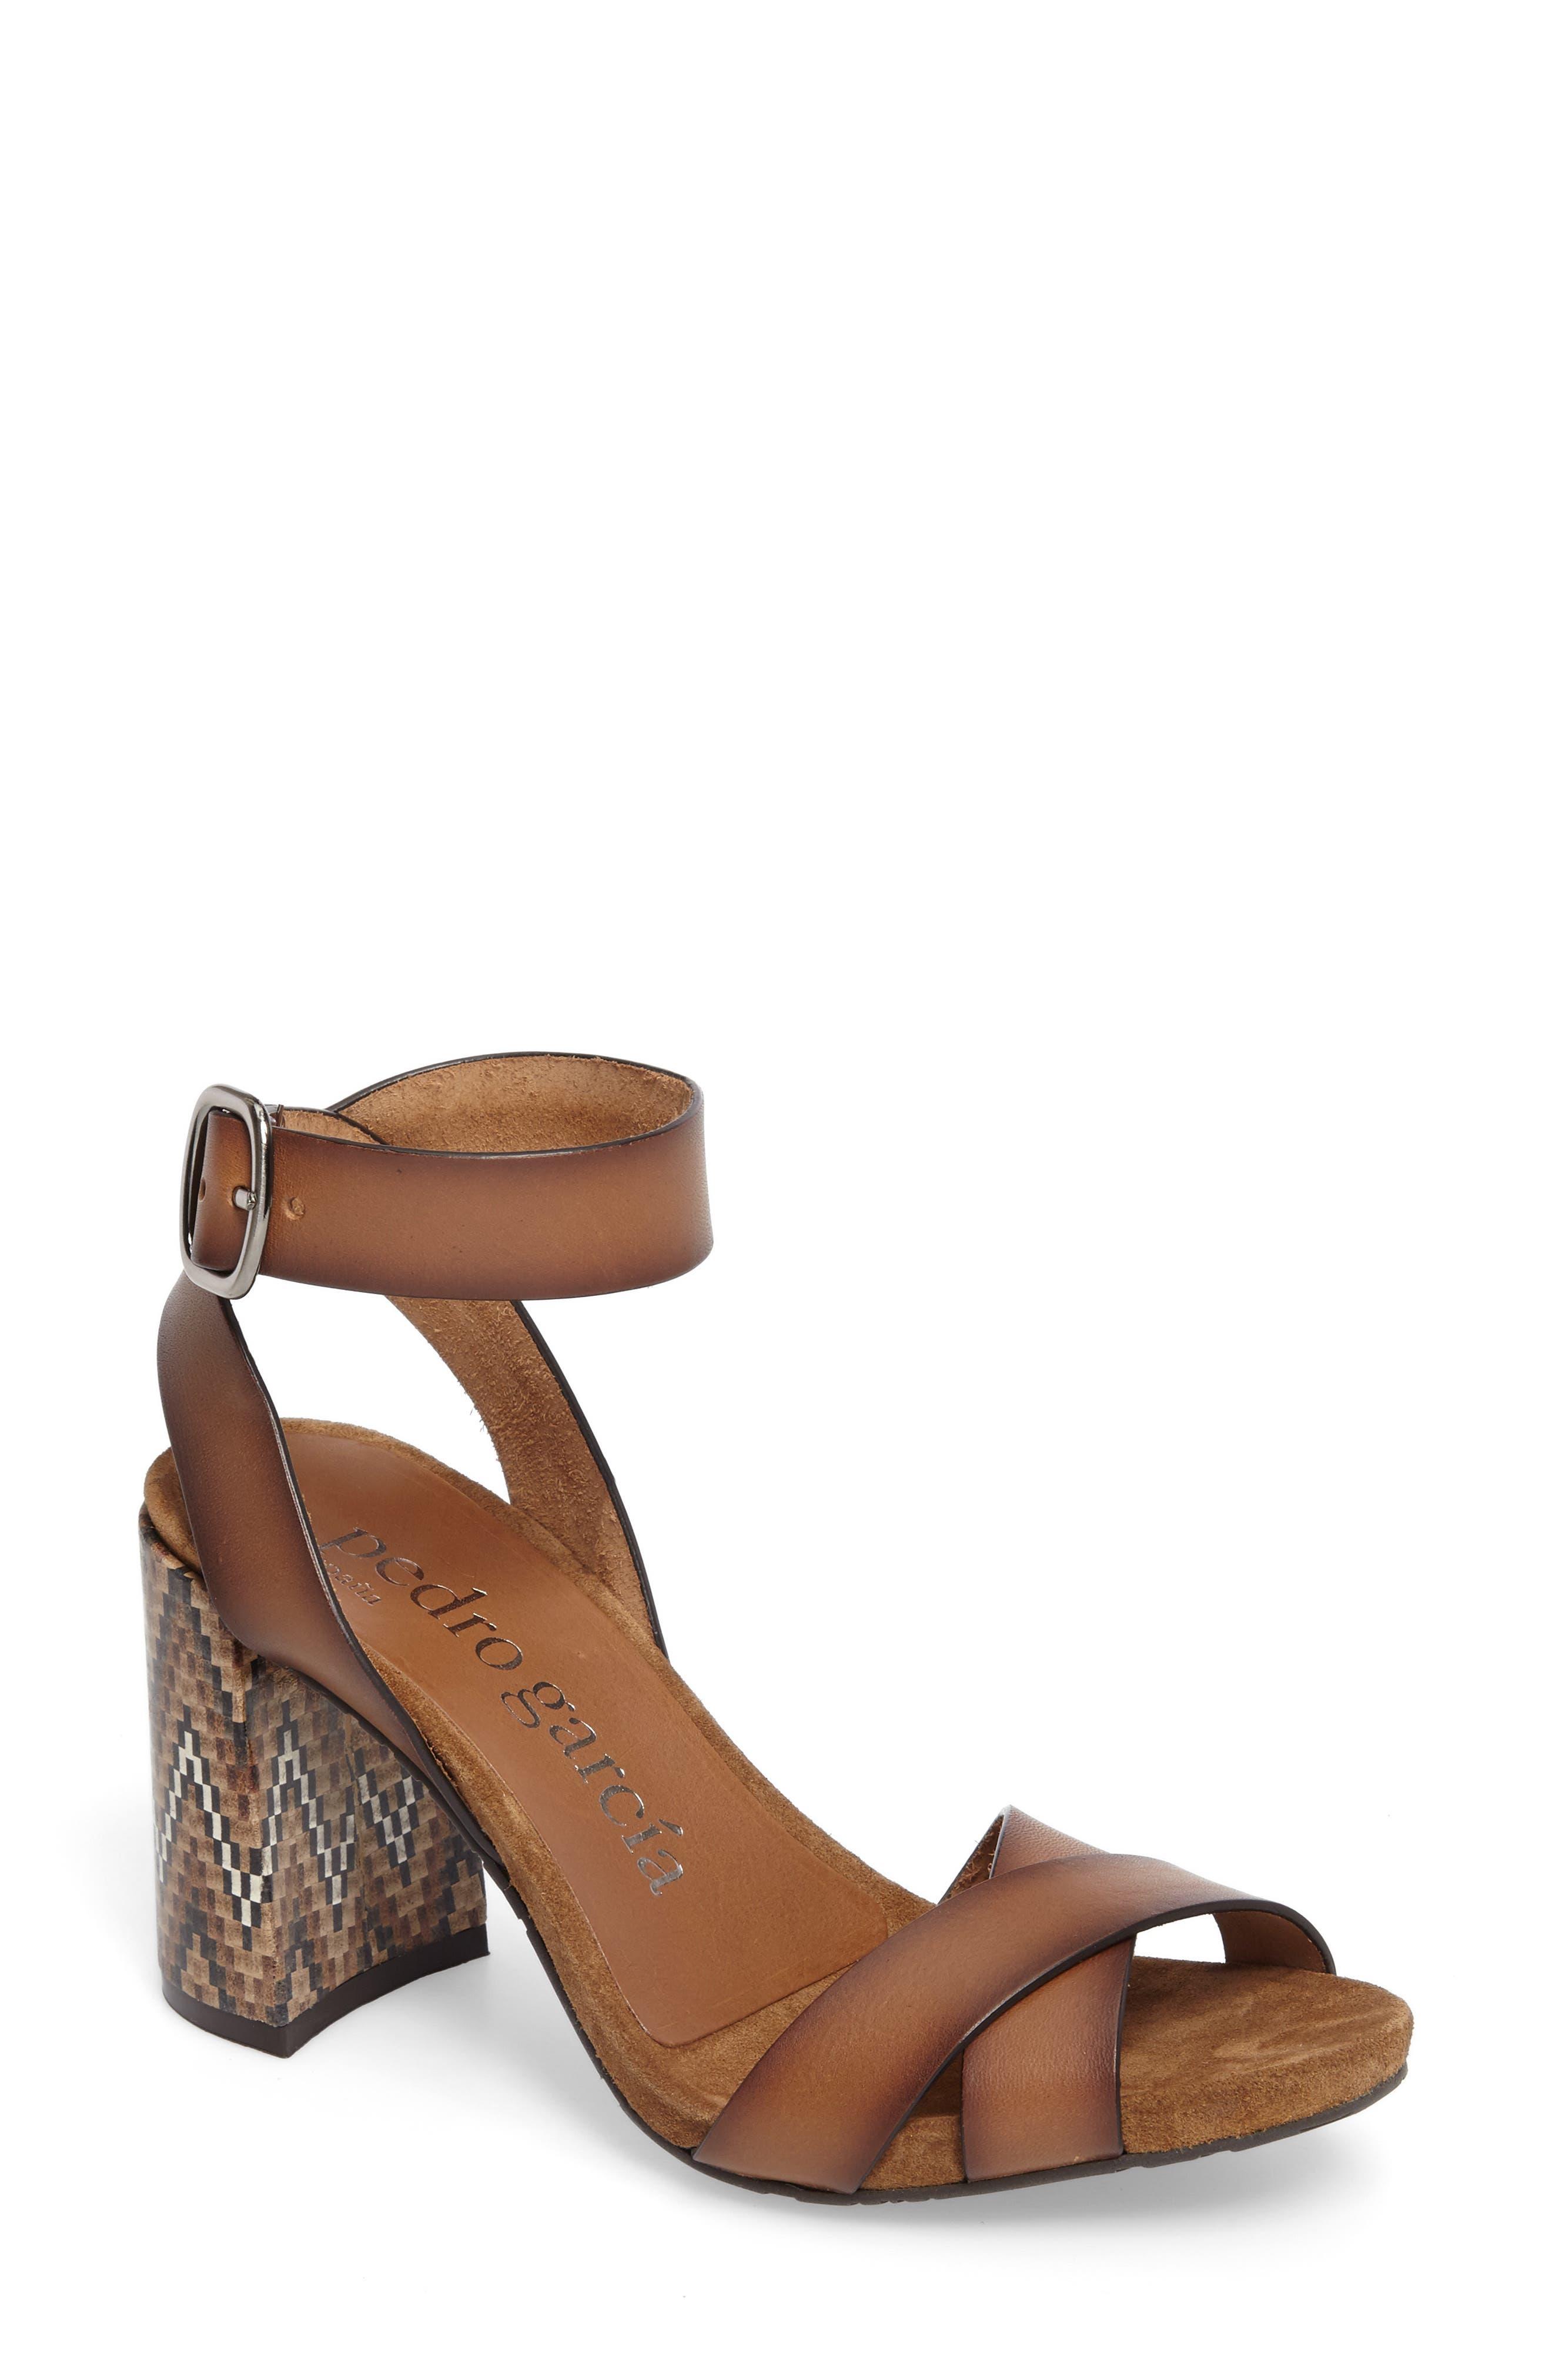 Yemba Embellished Heel Sandal,                             Main thumbnail 1, color,                             Cigar Vacchetta